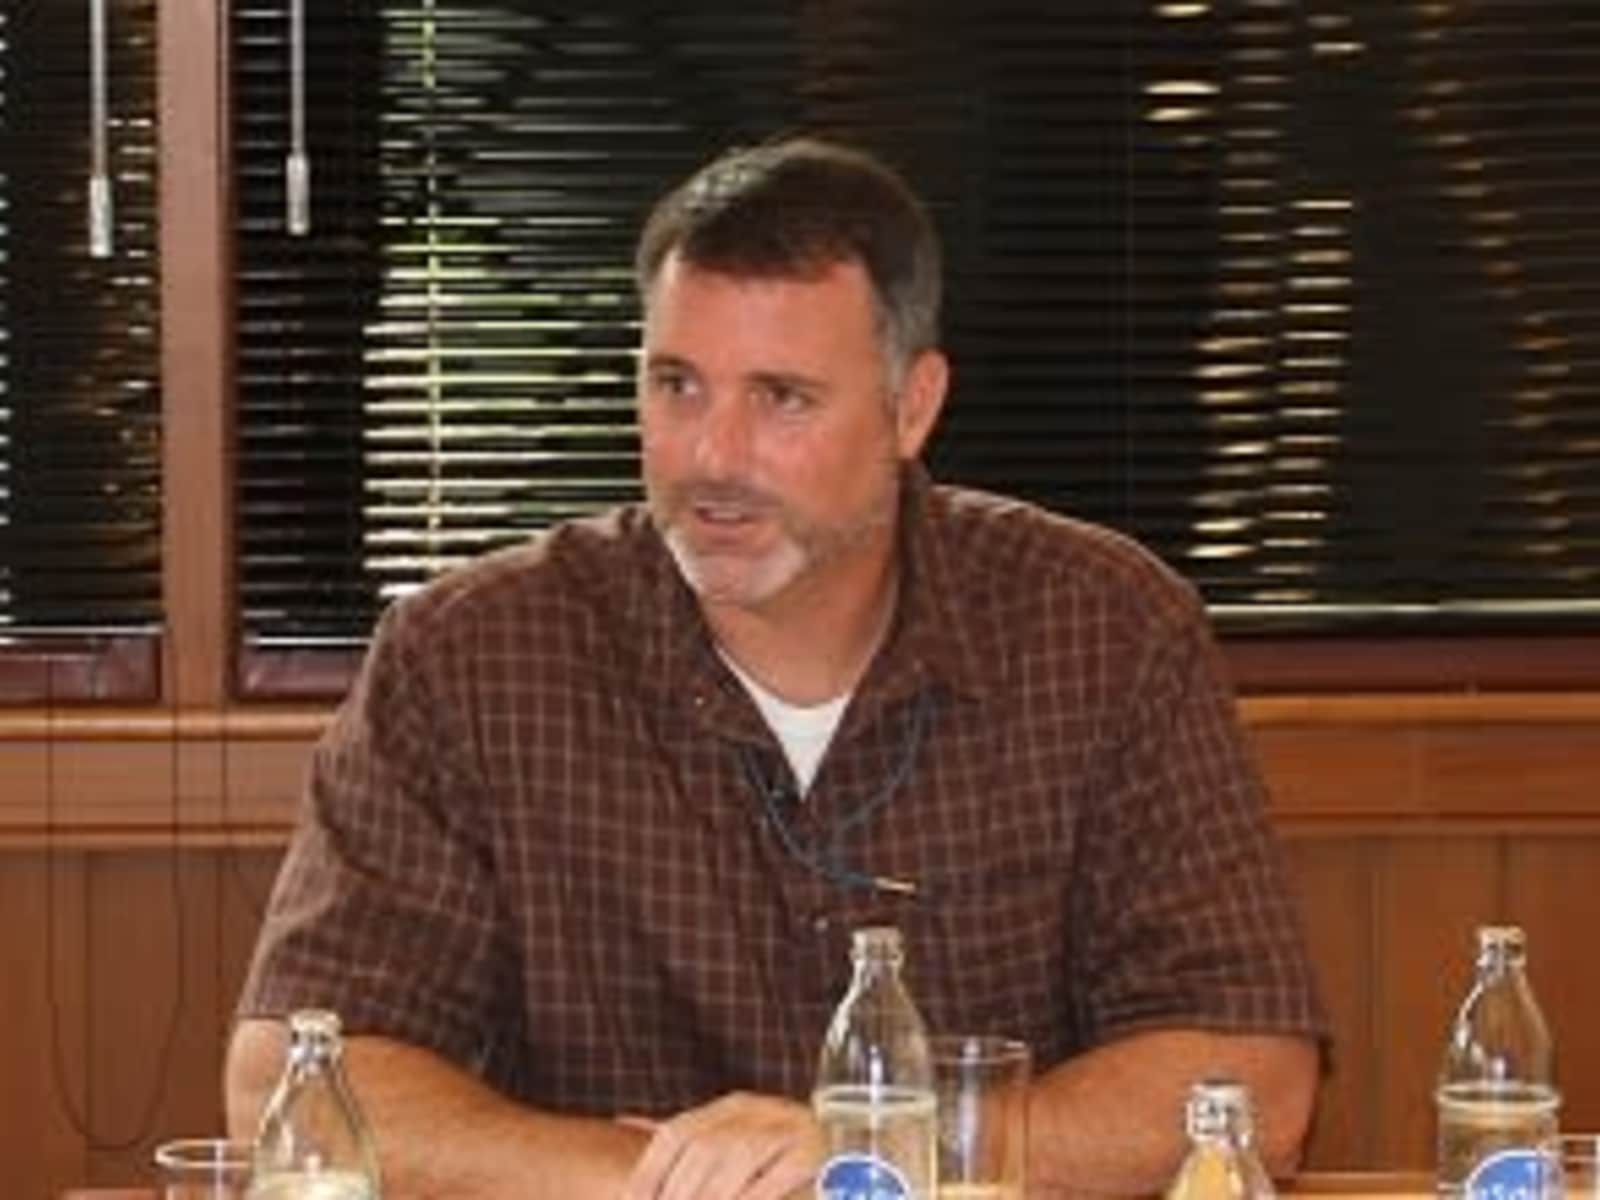 Michael from Seattle, Washington, United States